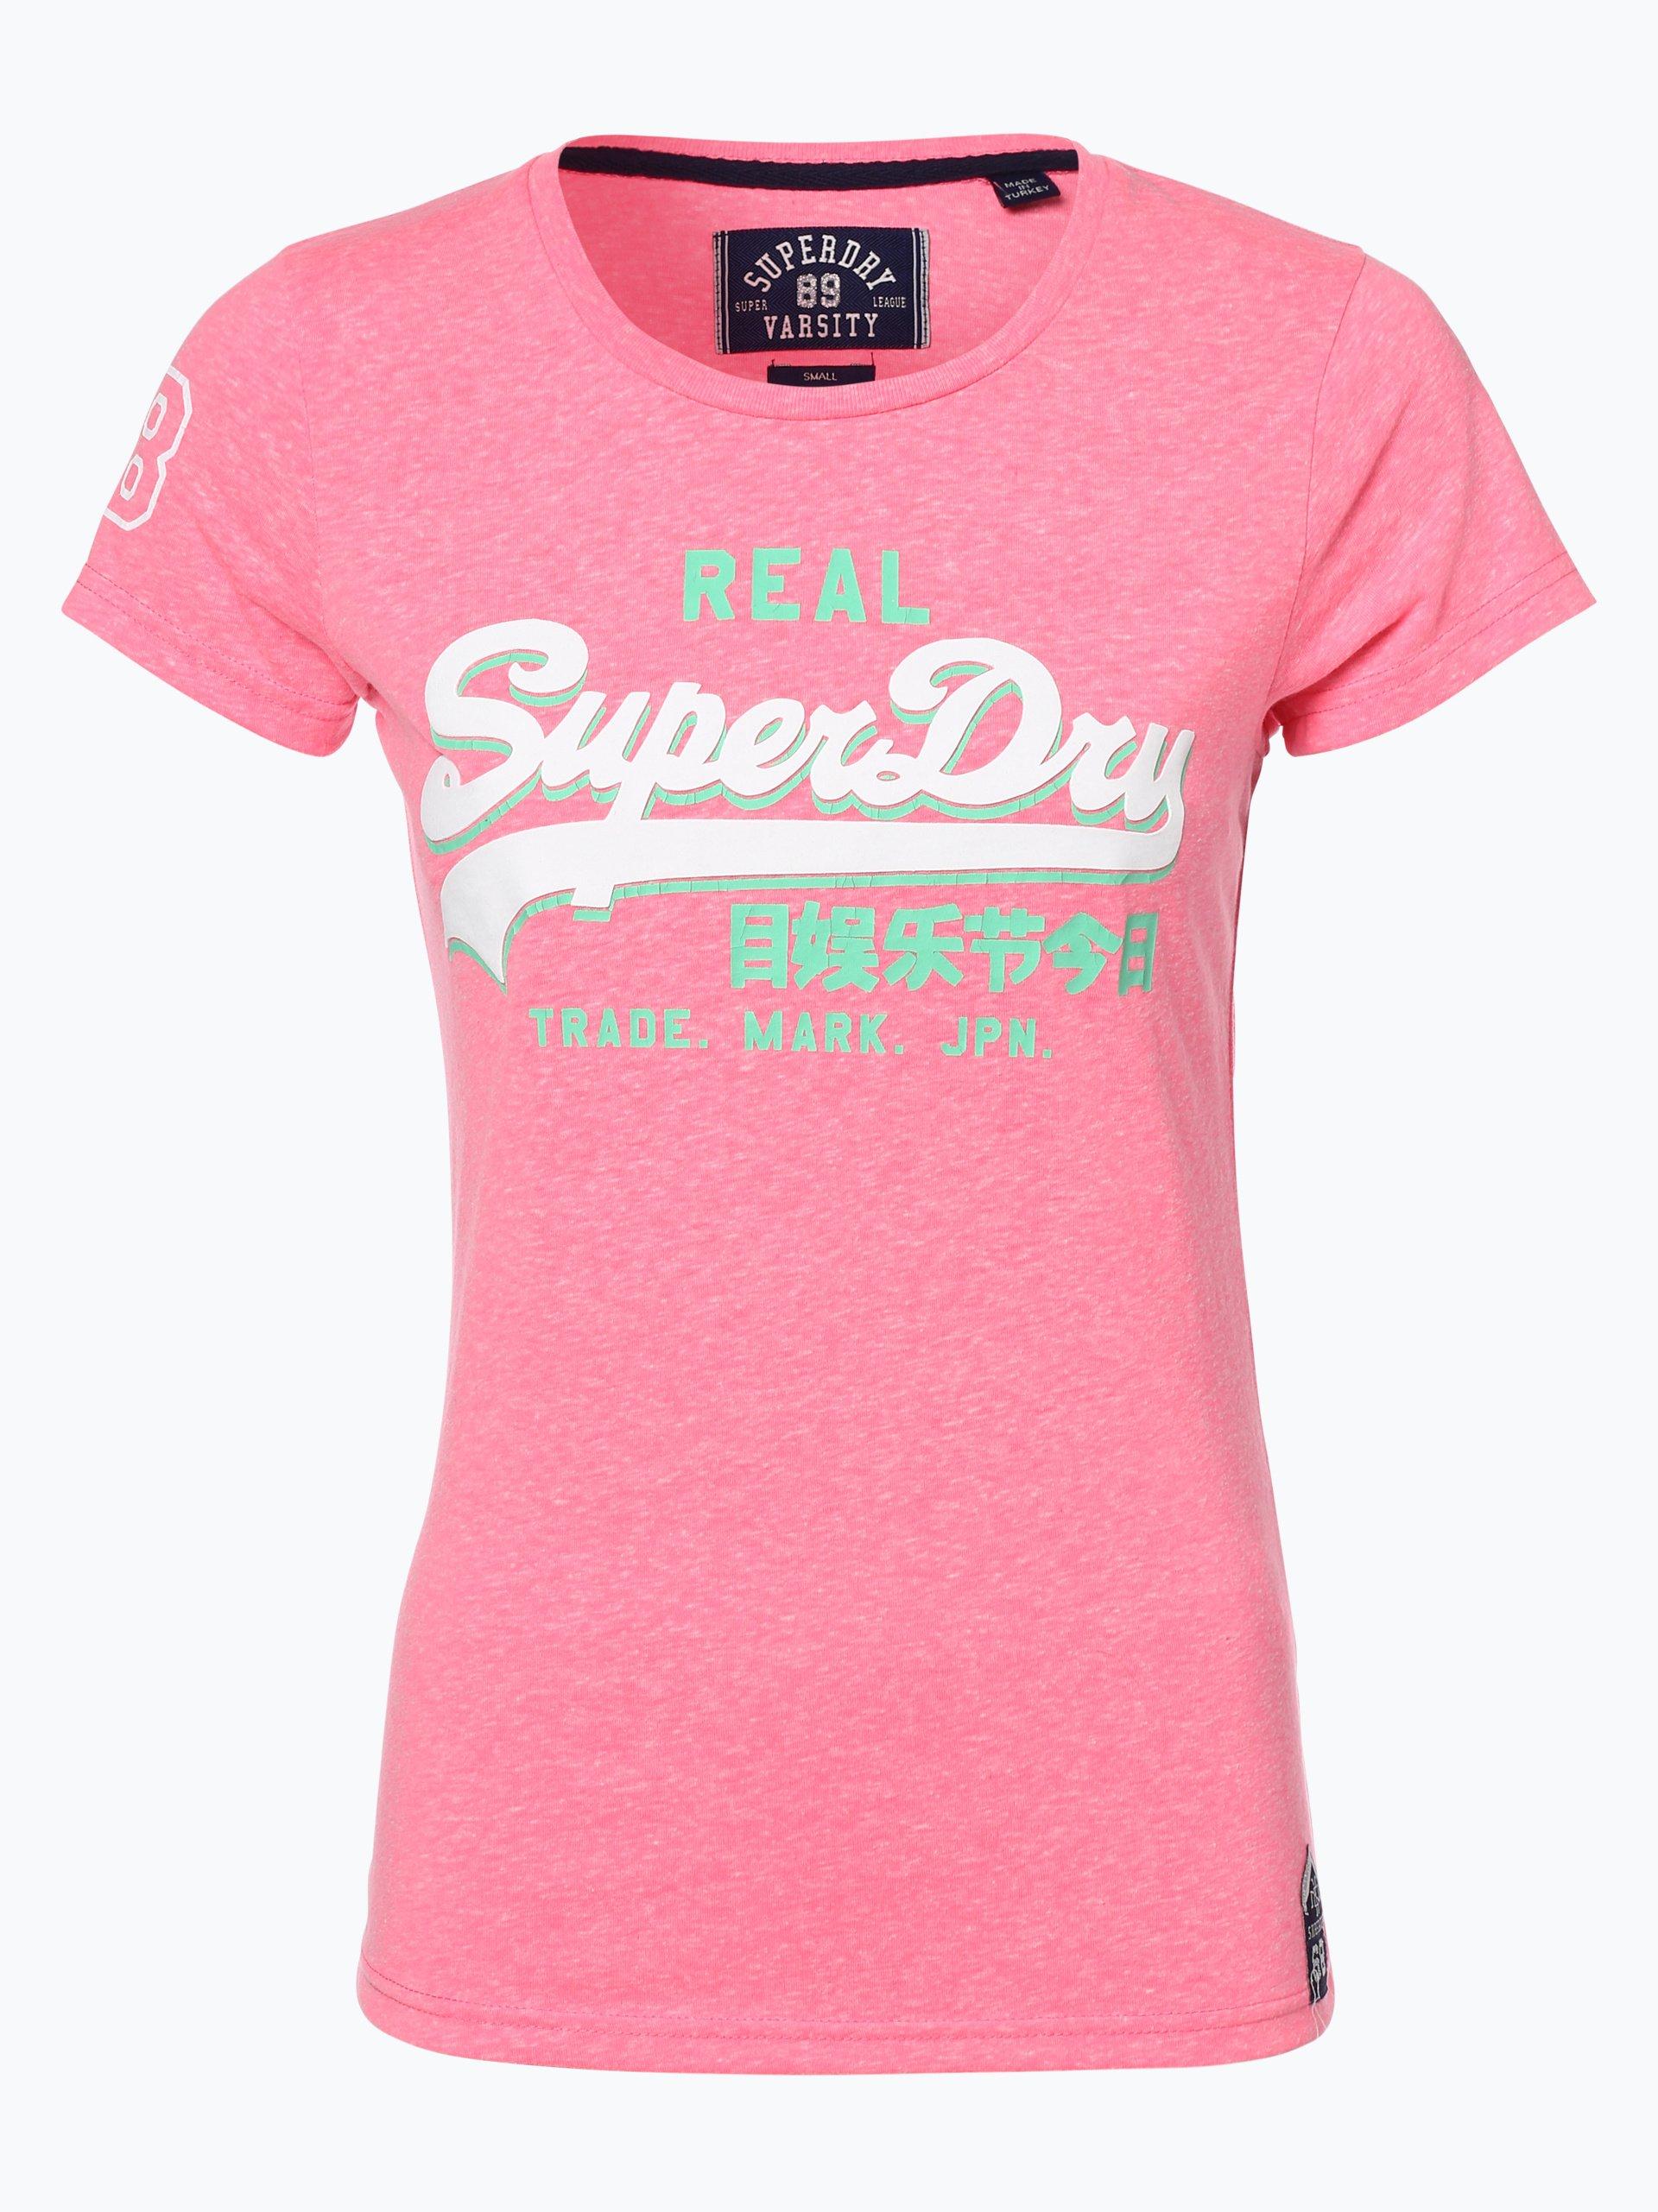 superdry damen t shirt pink rosa gemustert online kaufen. Black Bedroom Furniture Sets. Home Design Ideas